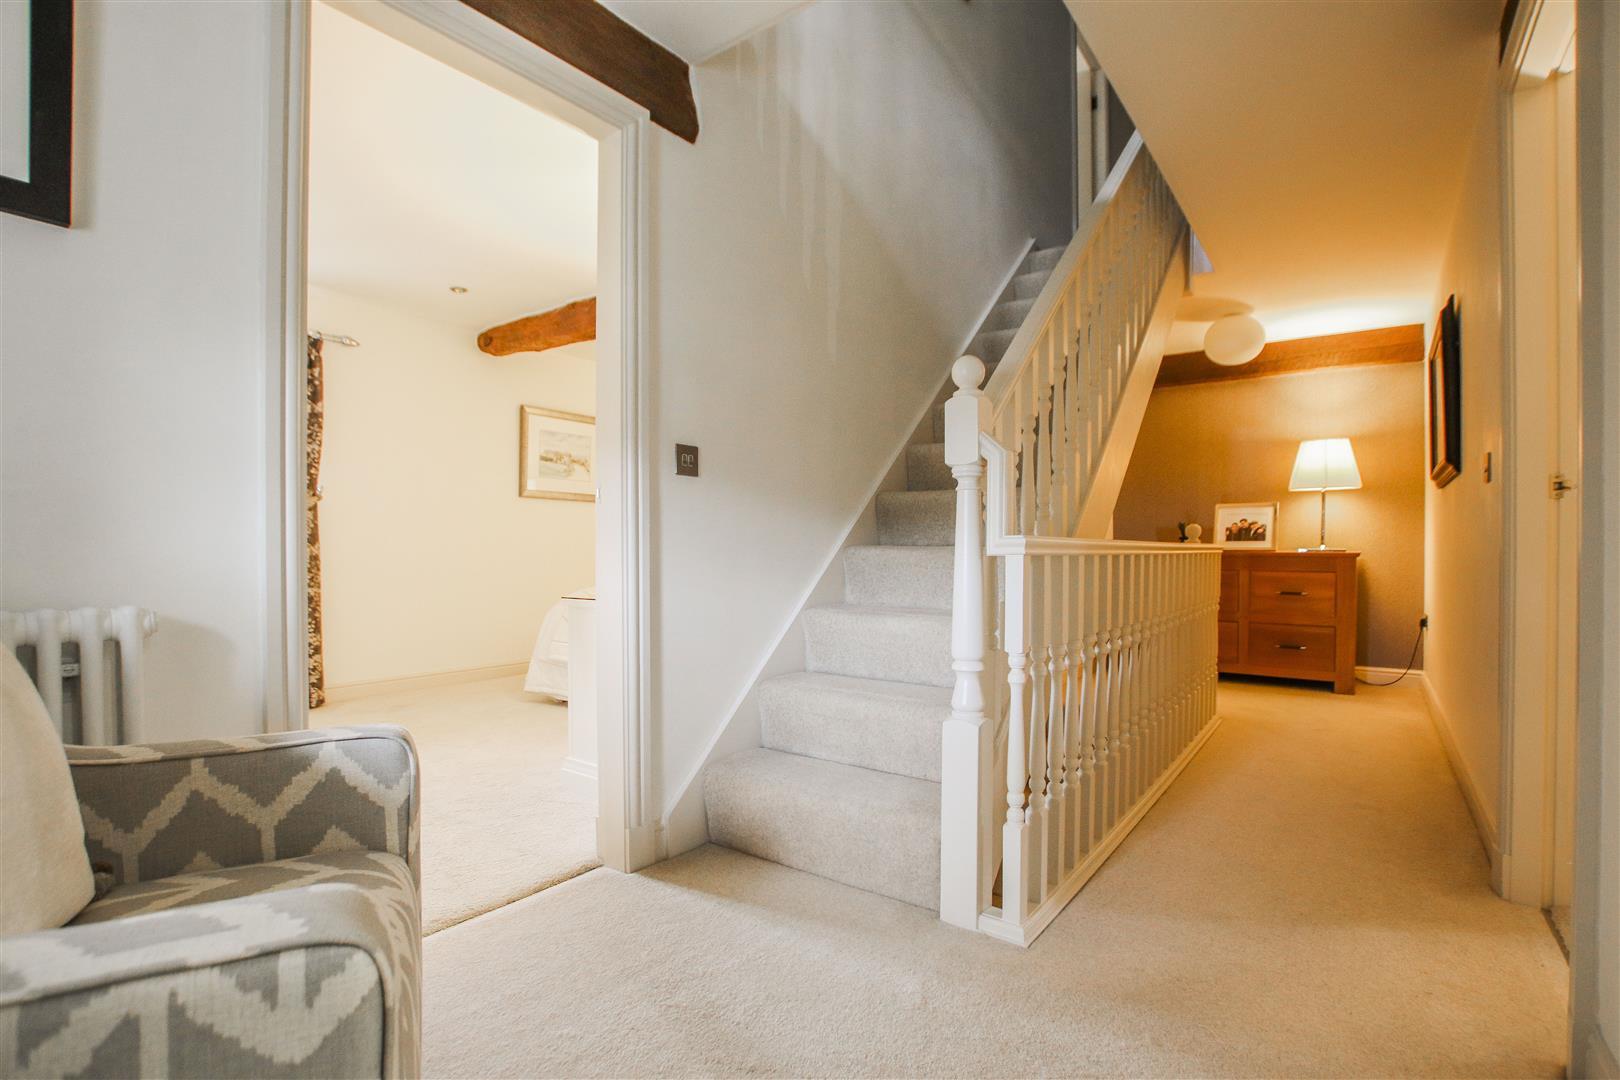 5 Bedroom Semi-detached House For Sale - 19.JPG